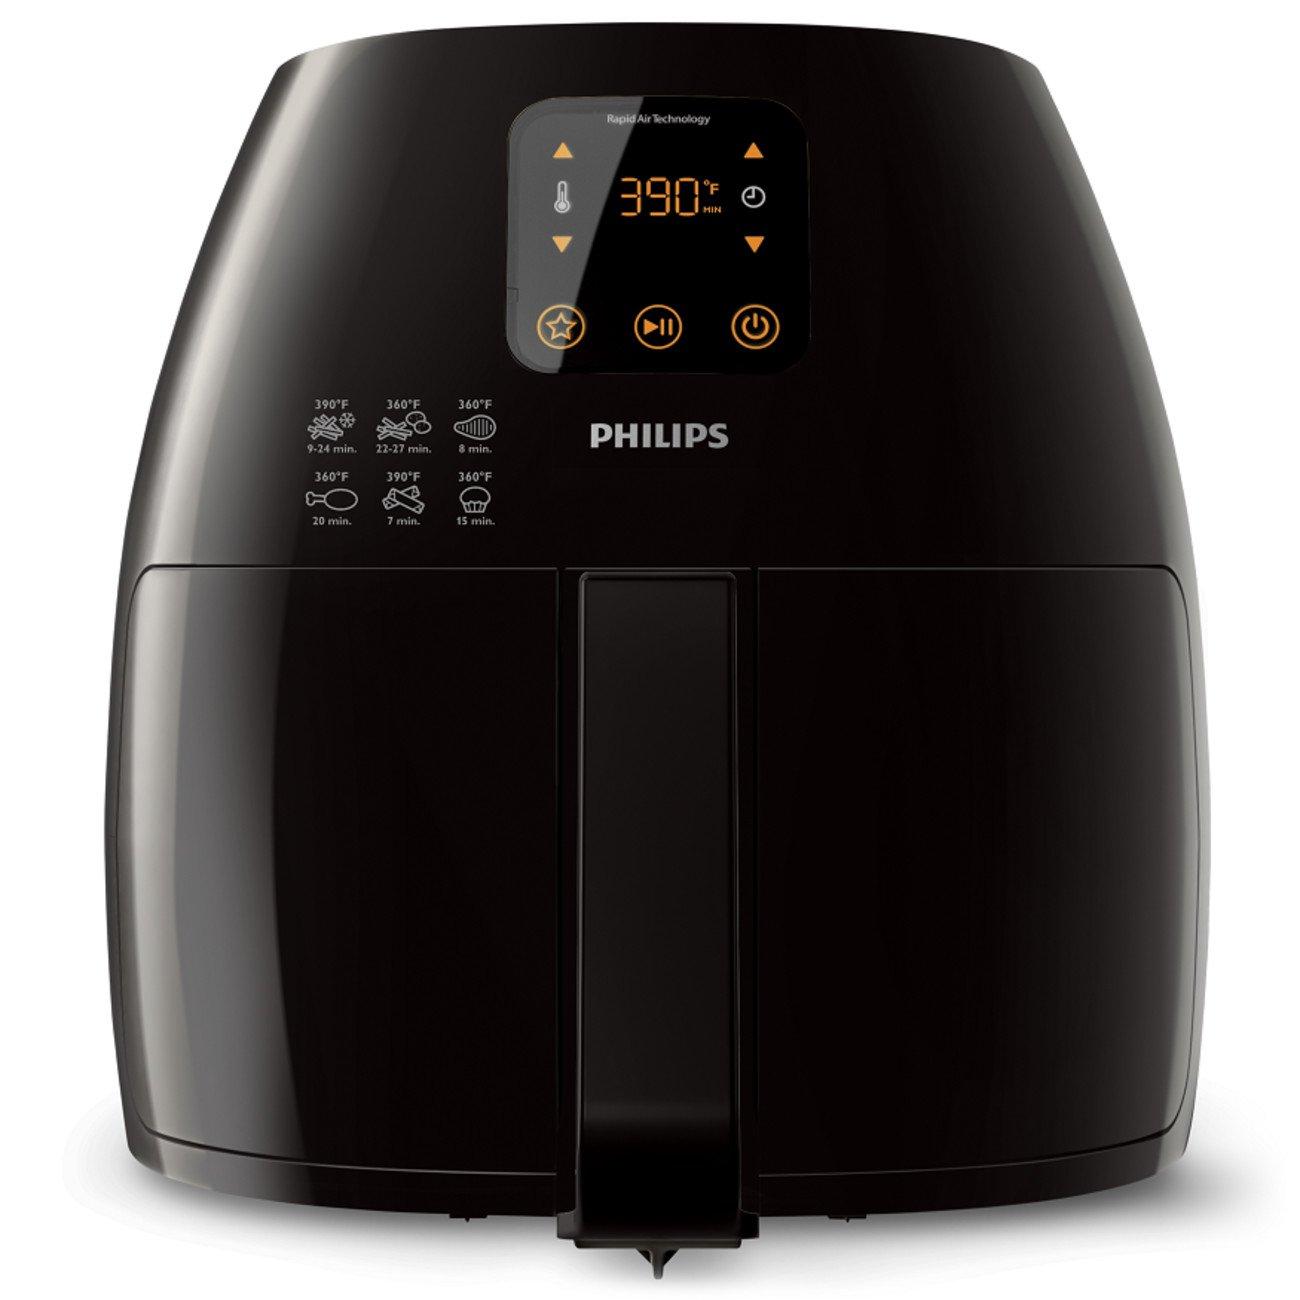 Philips Starfish Technology XL Airfryer, Digital Interface, Black - 2.65lb/3.5qt  HD9240/94 by Philips Kitchen Appliances